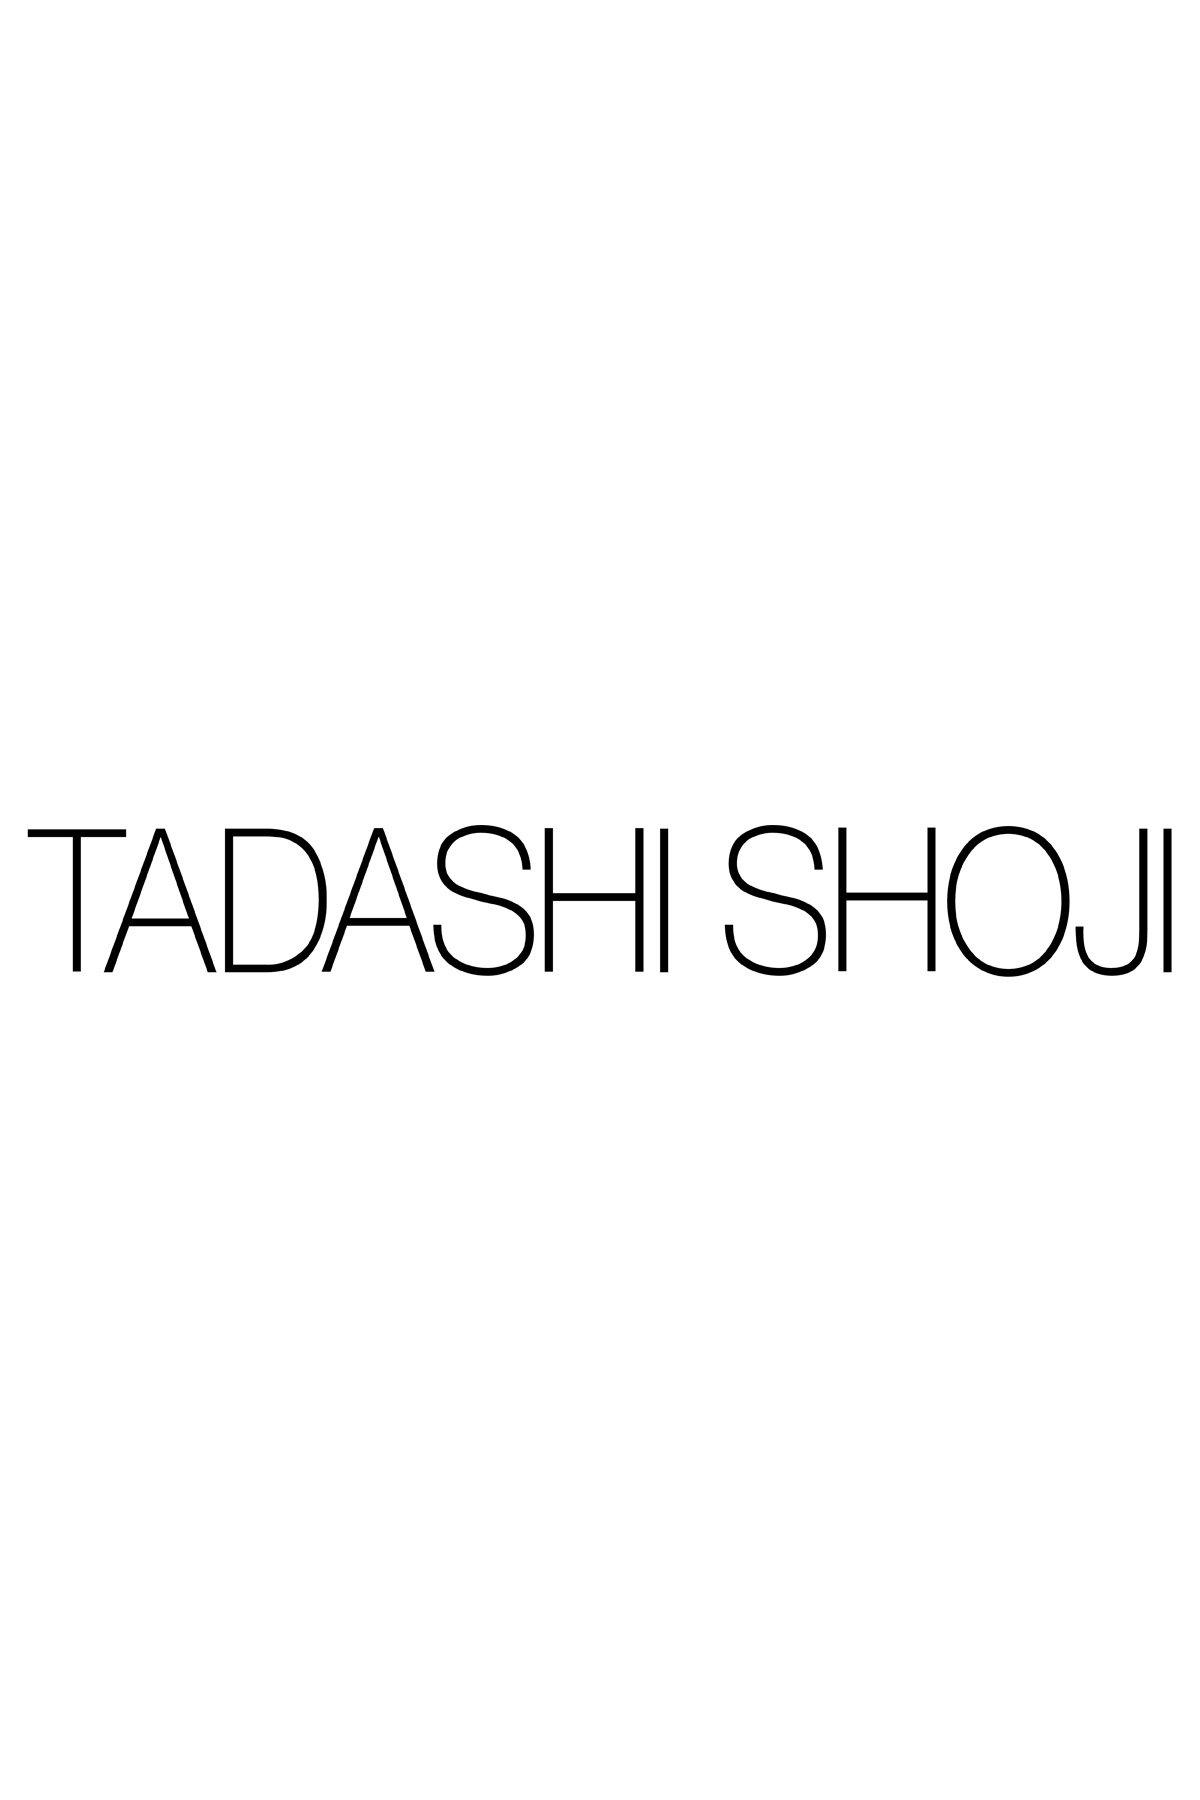 Tadashi Shoji - Corded Embroidery on Tulle Dress with Sheer Illusion Neckline